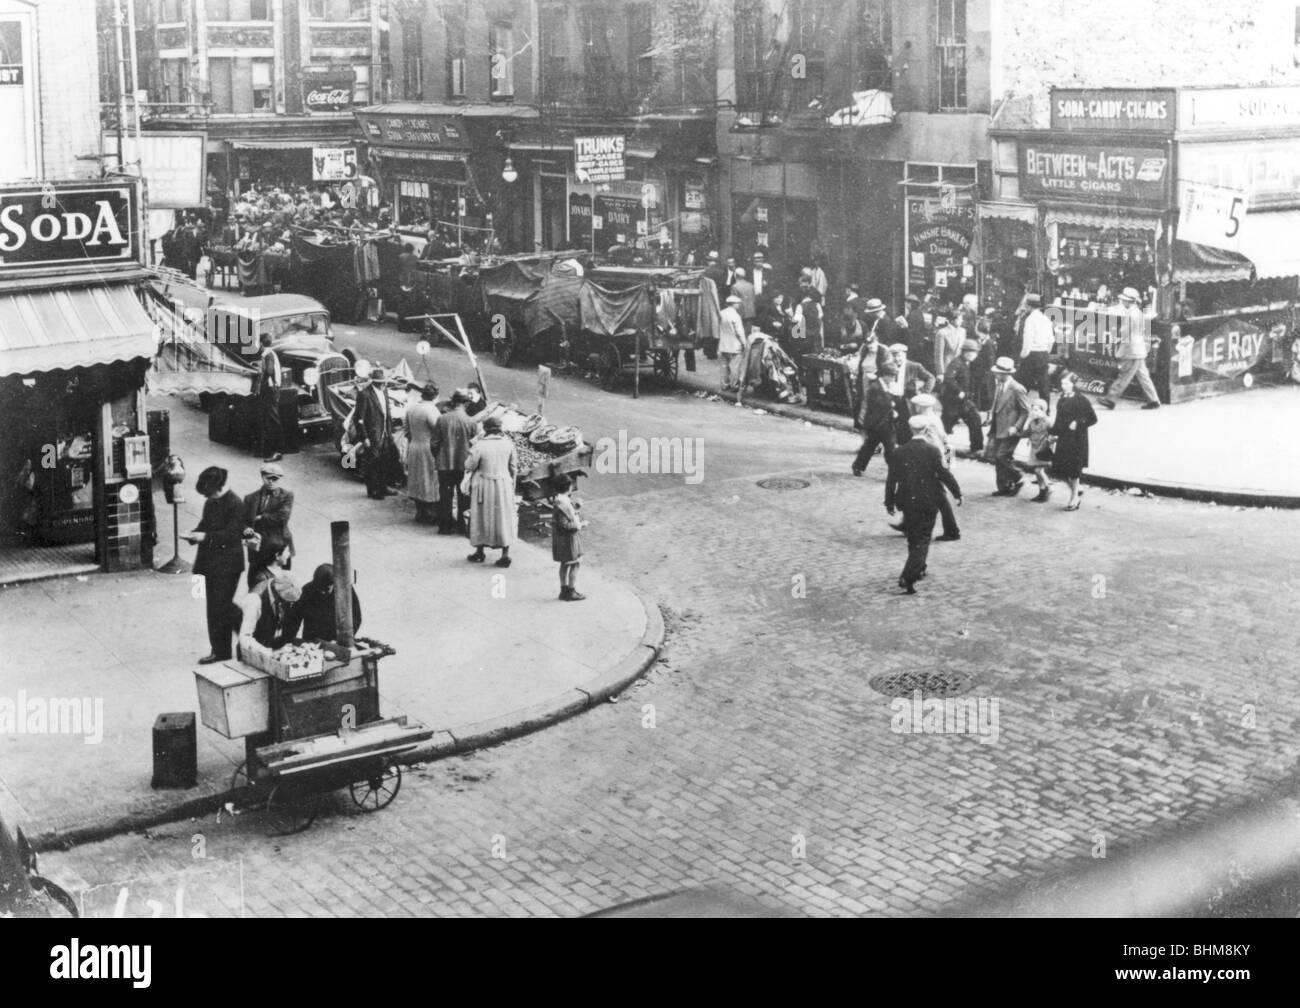 Street scene, USA, 1920s. - Stock Image